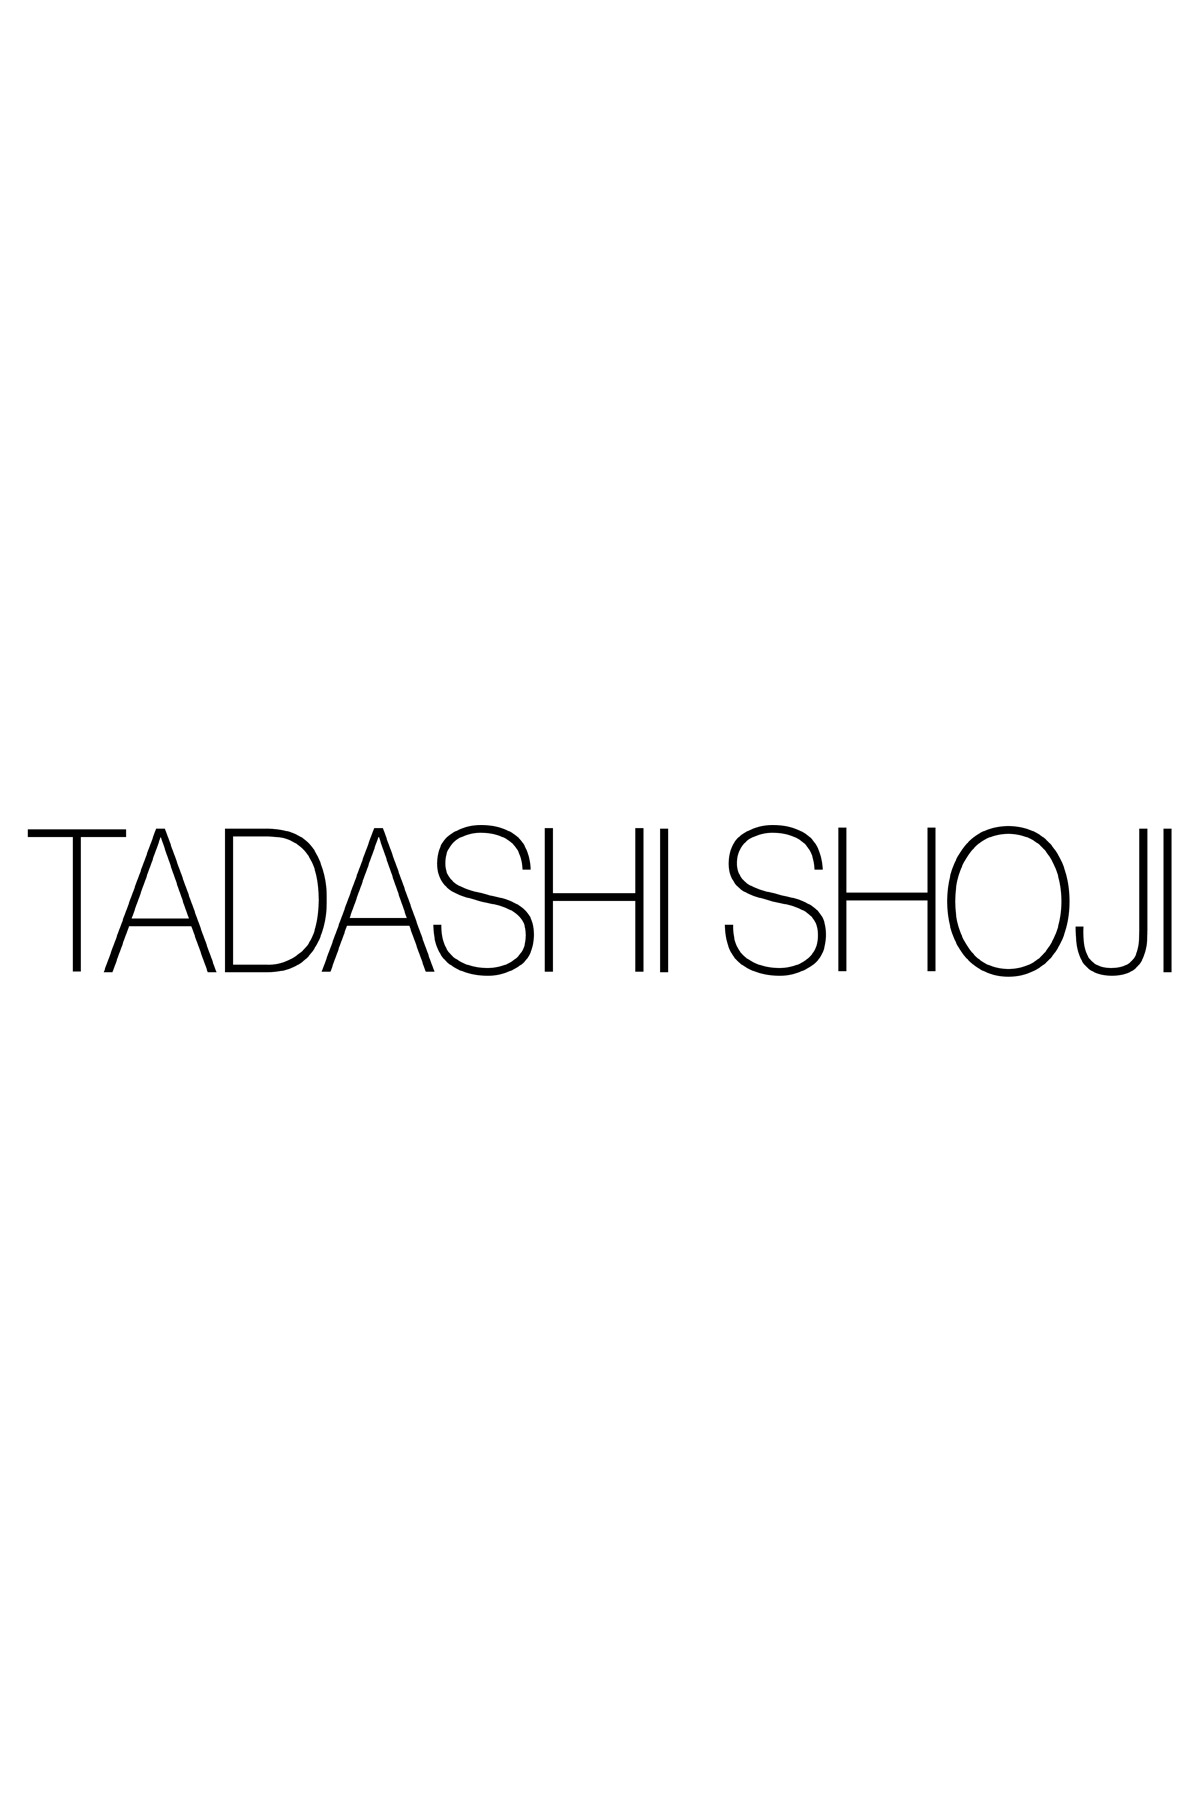 Tadashi Shoji - Scarlet Gown